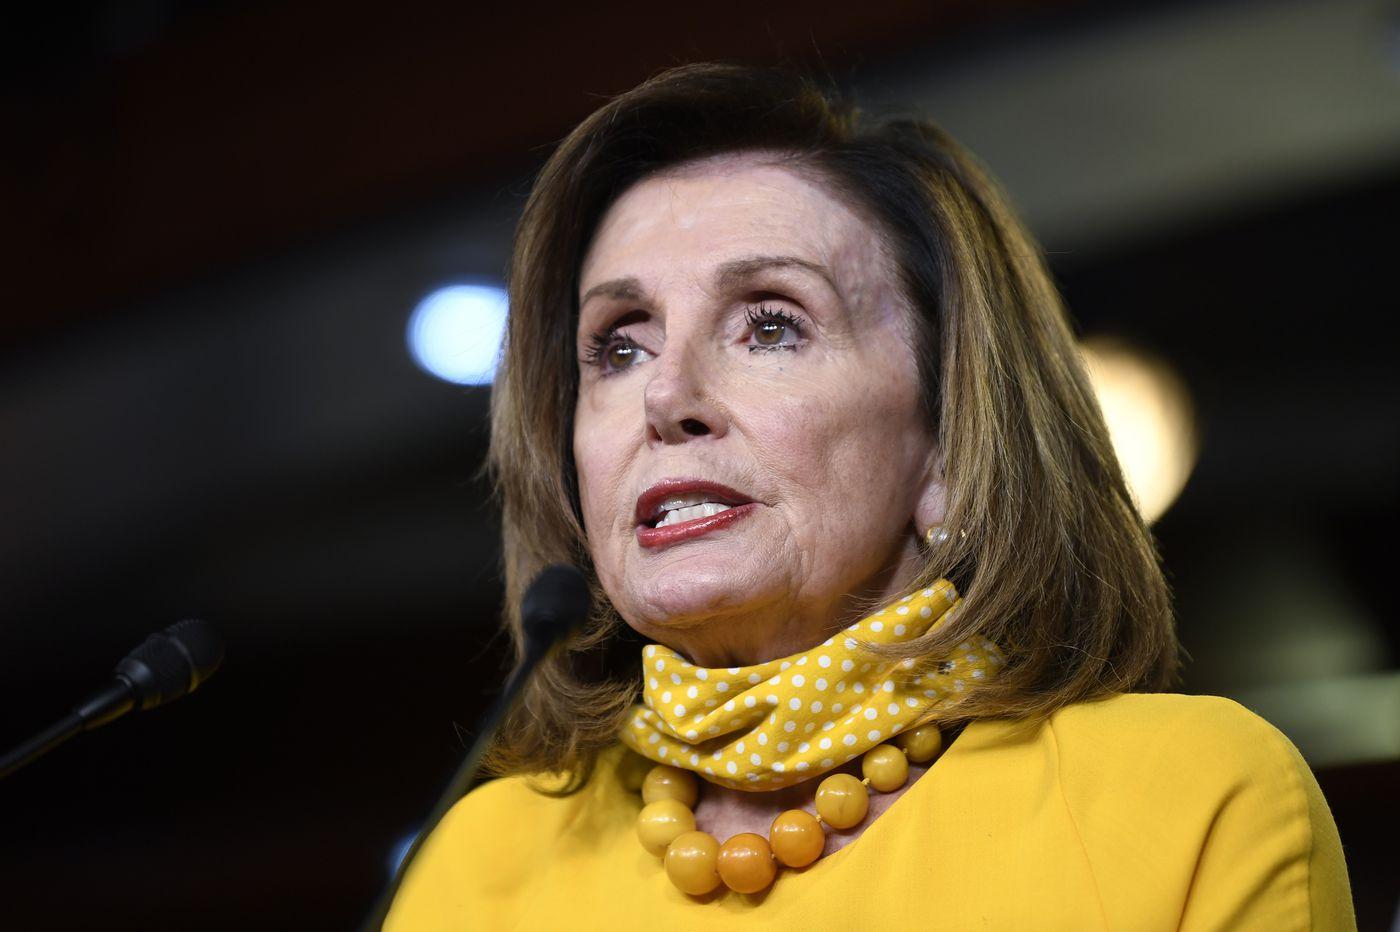 Nancy Pelosi requiring coronavirus masks for lawmakers in House hearings